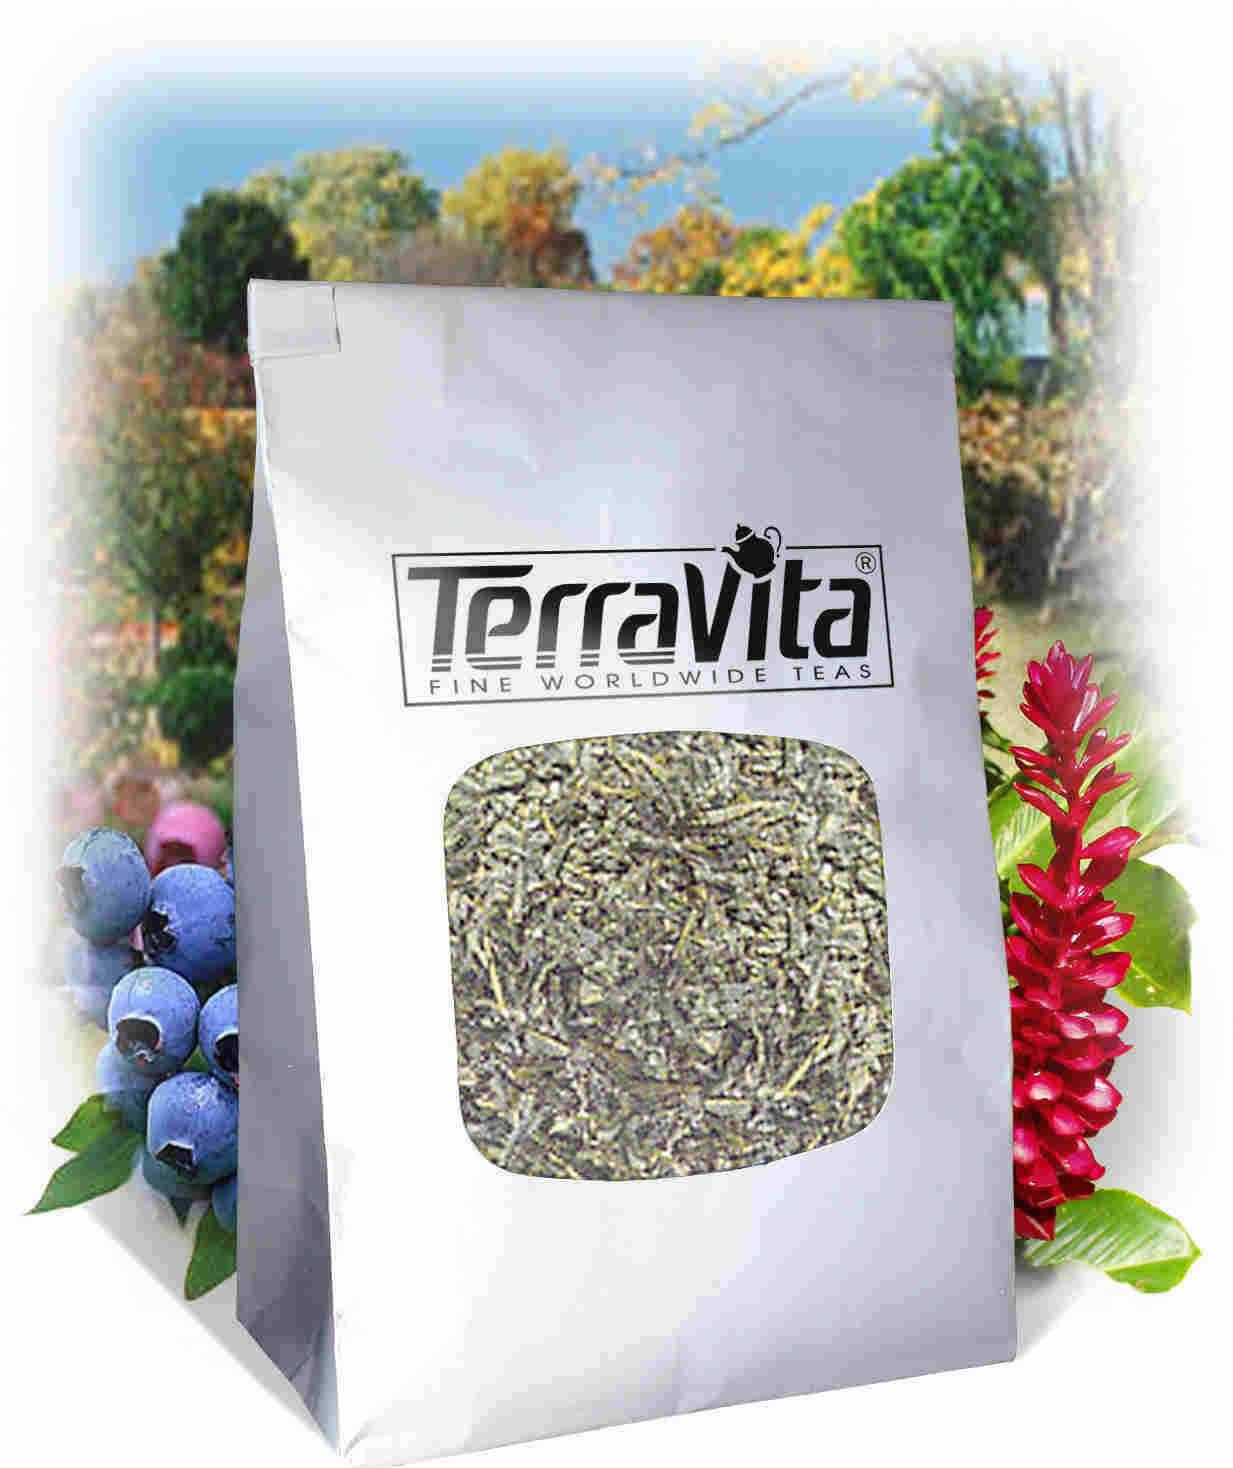 Thyroid Support Tea (Loose) - Bugleweed, Motherwort and Lemon Balm